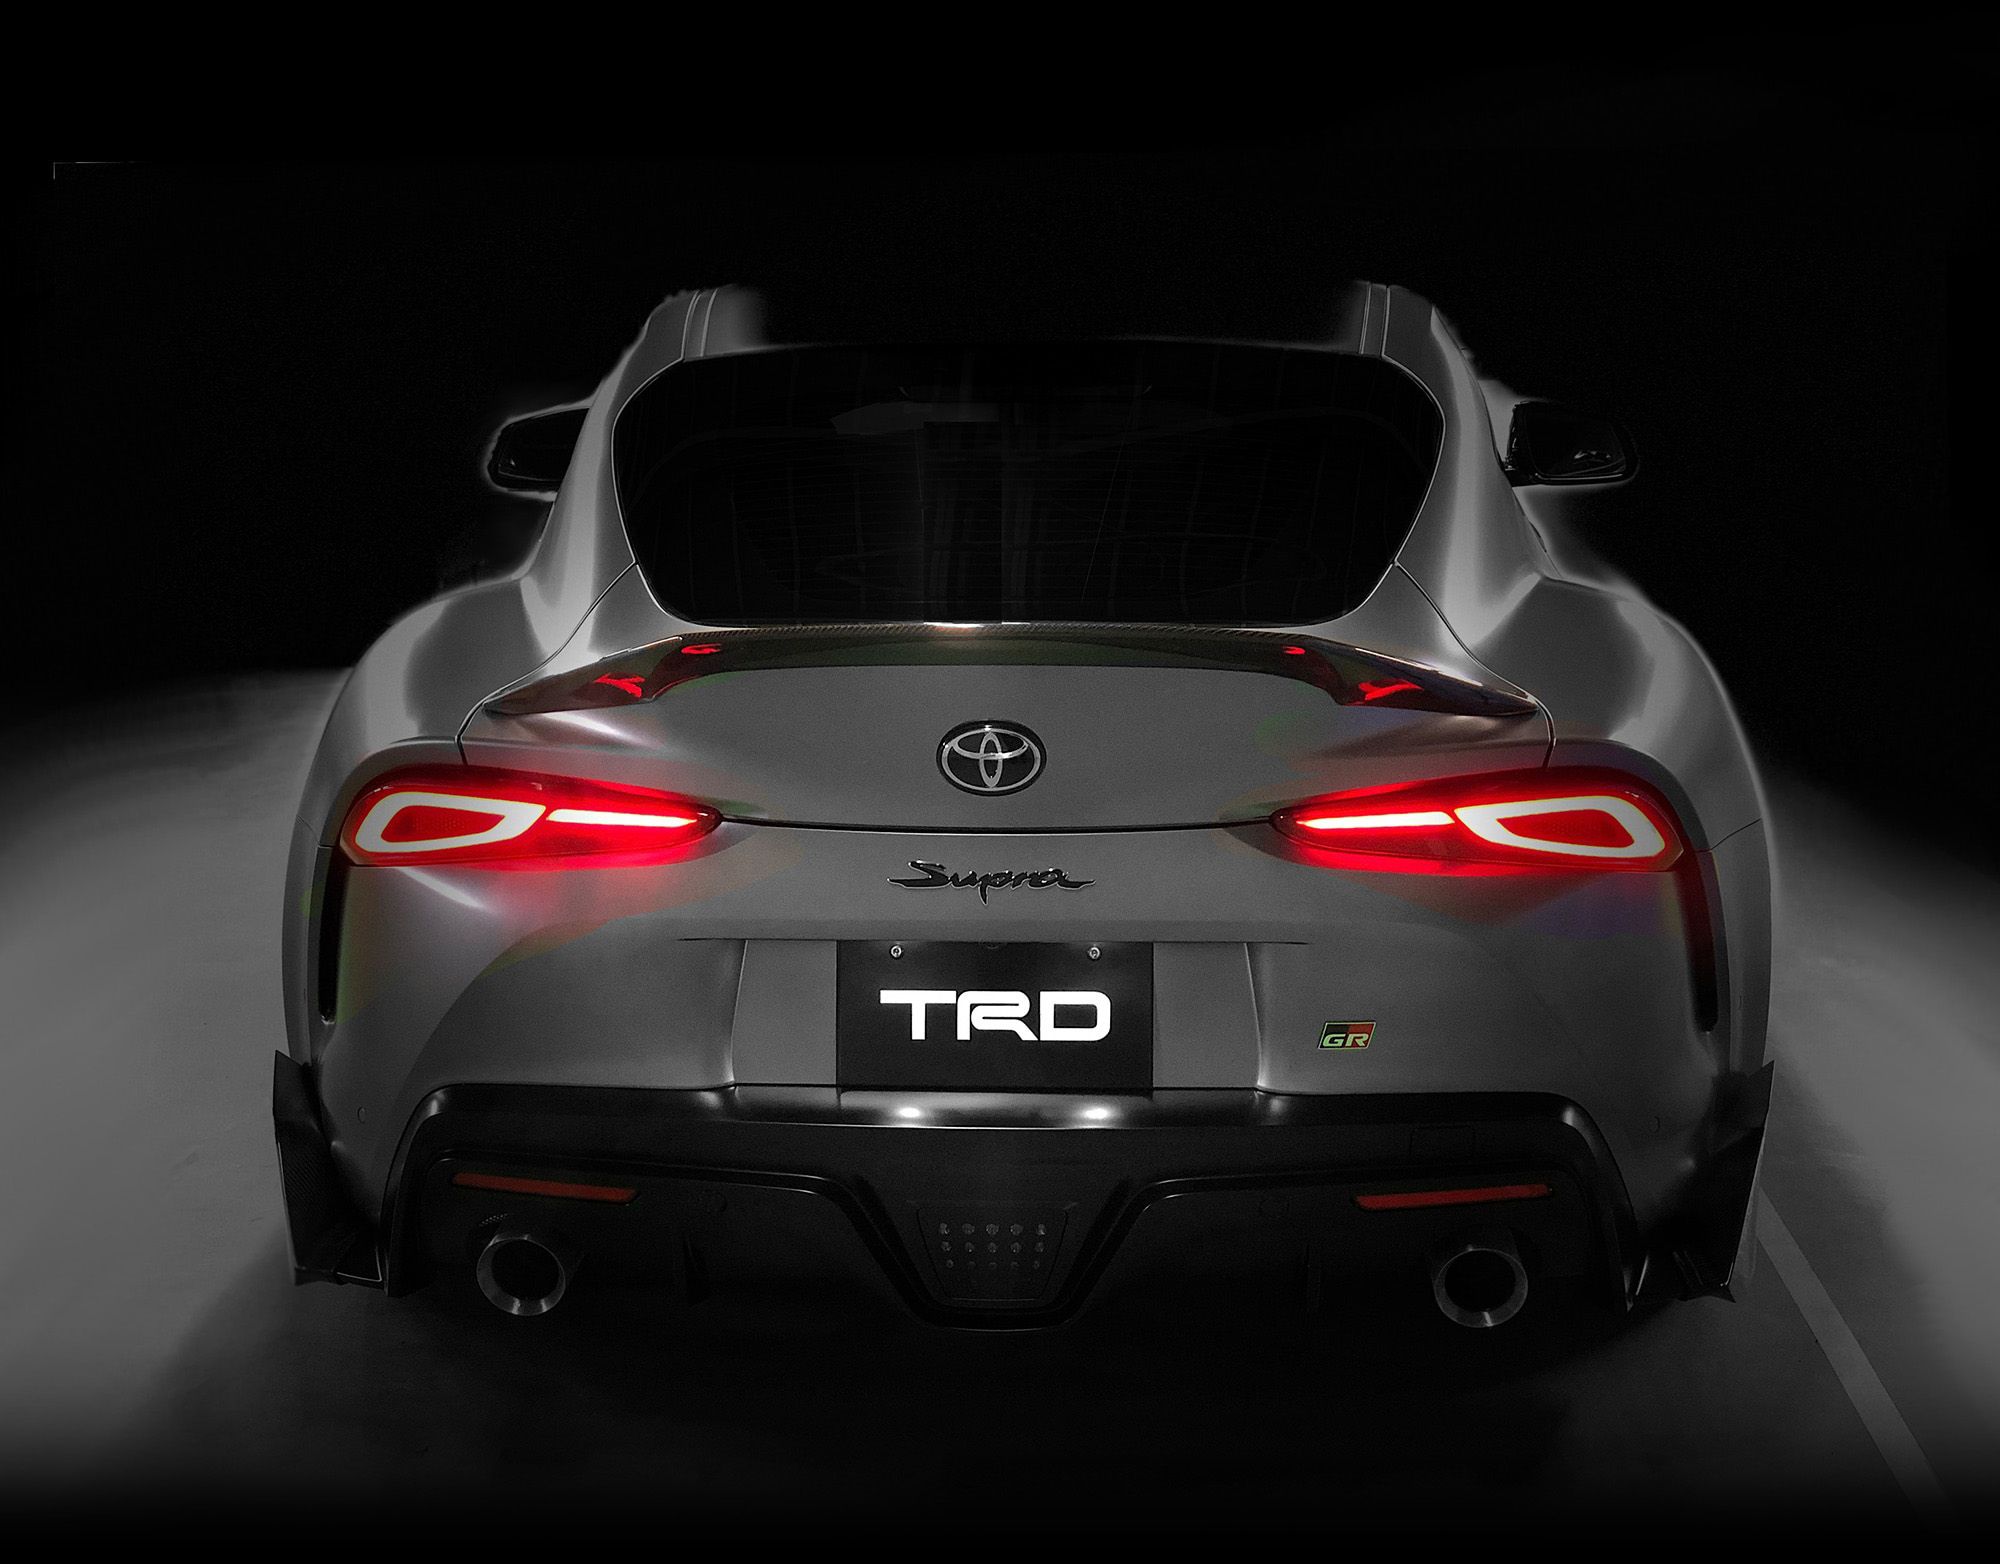 Toyota-Supra-TRD-3.jpg